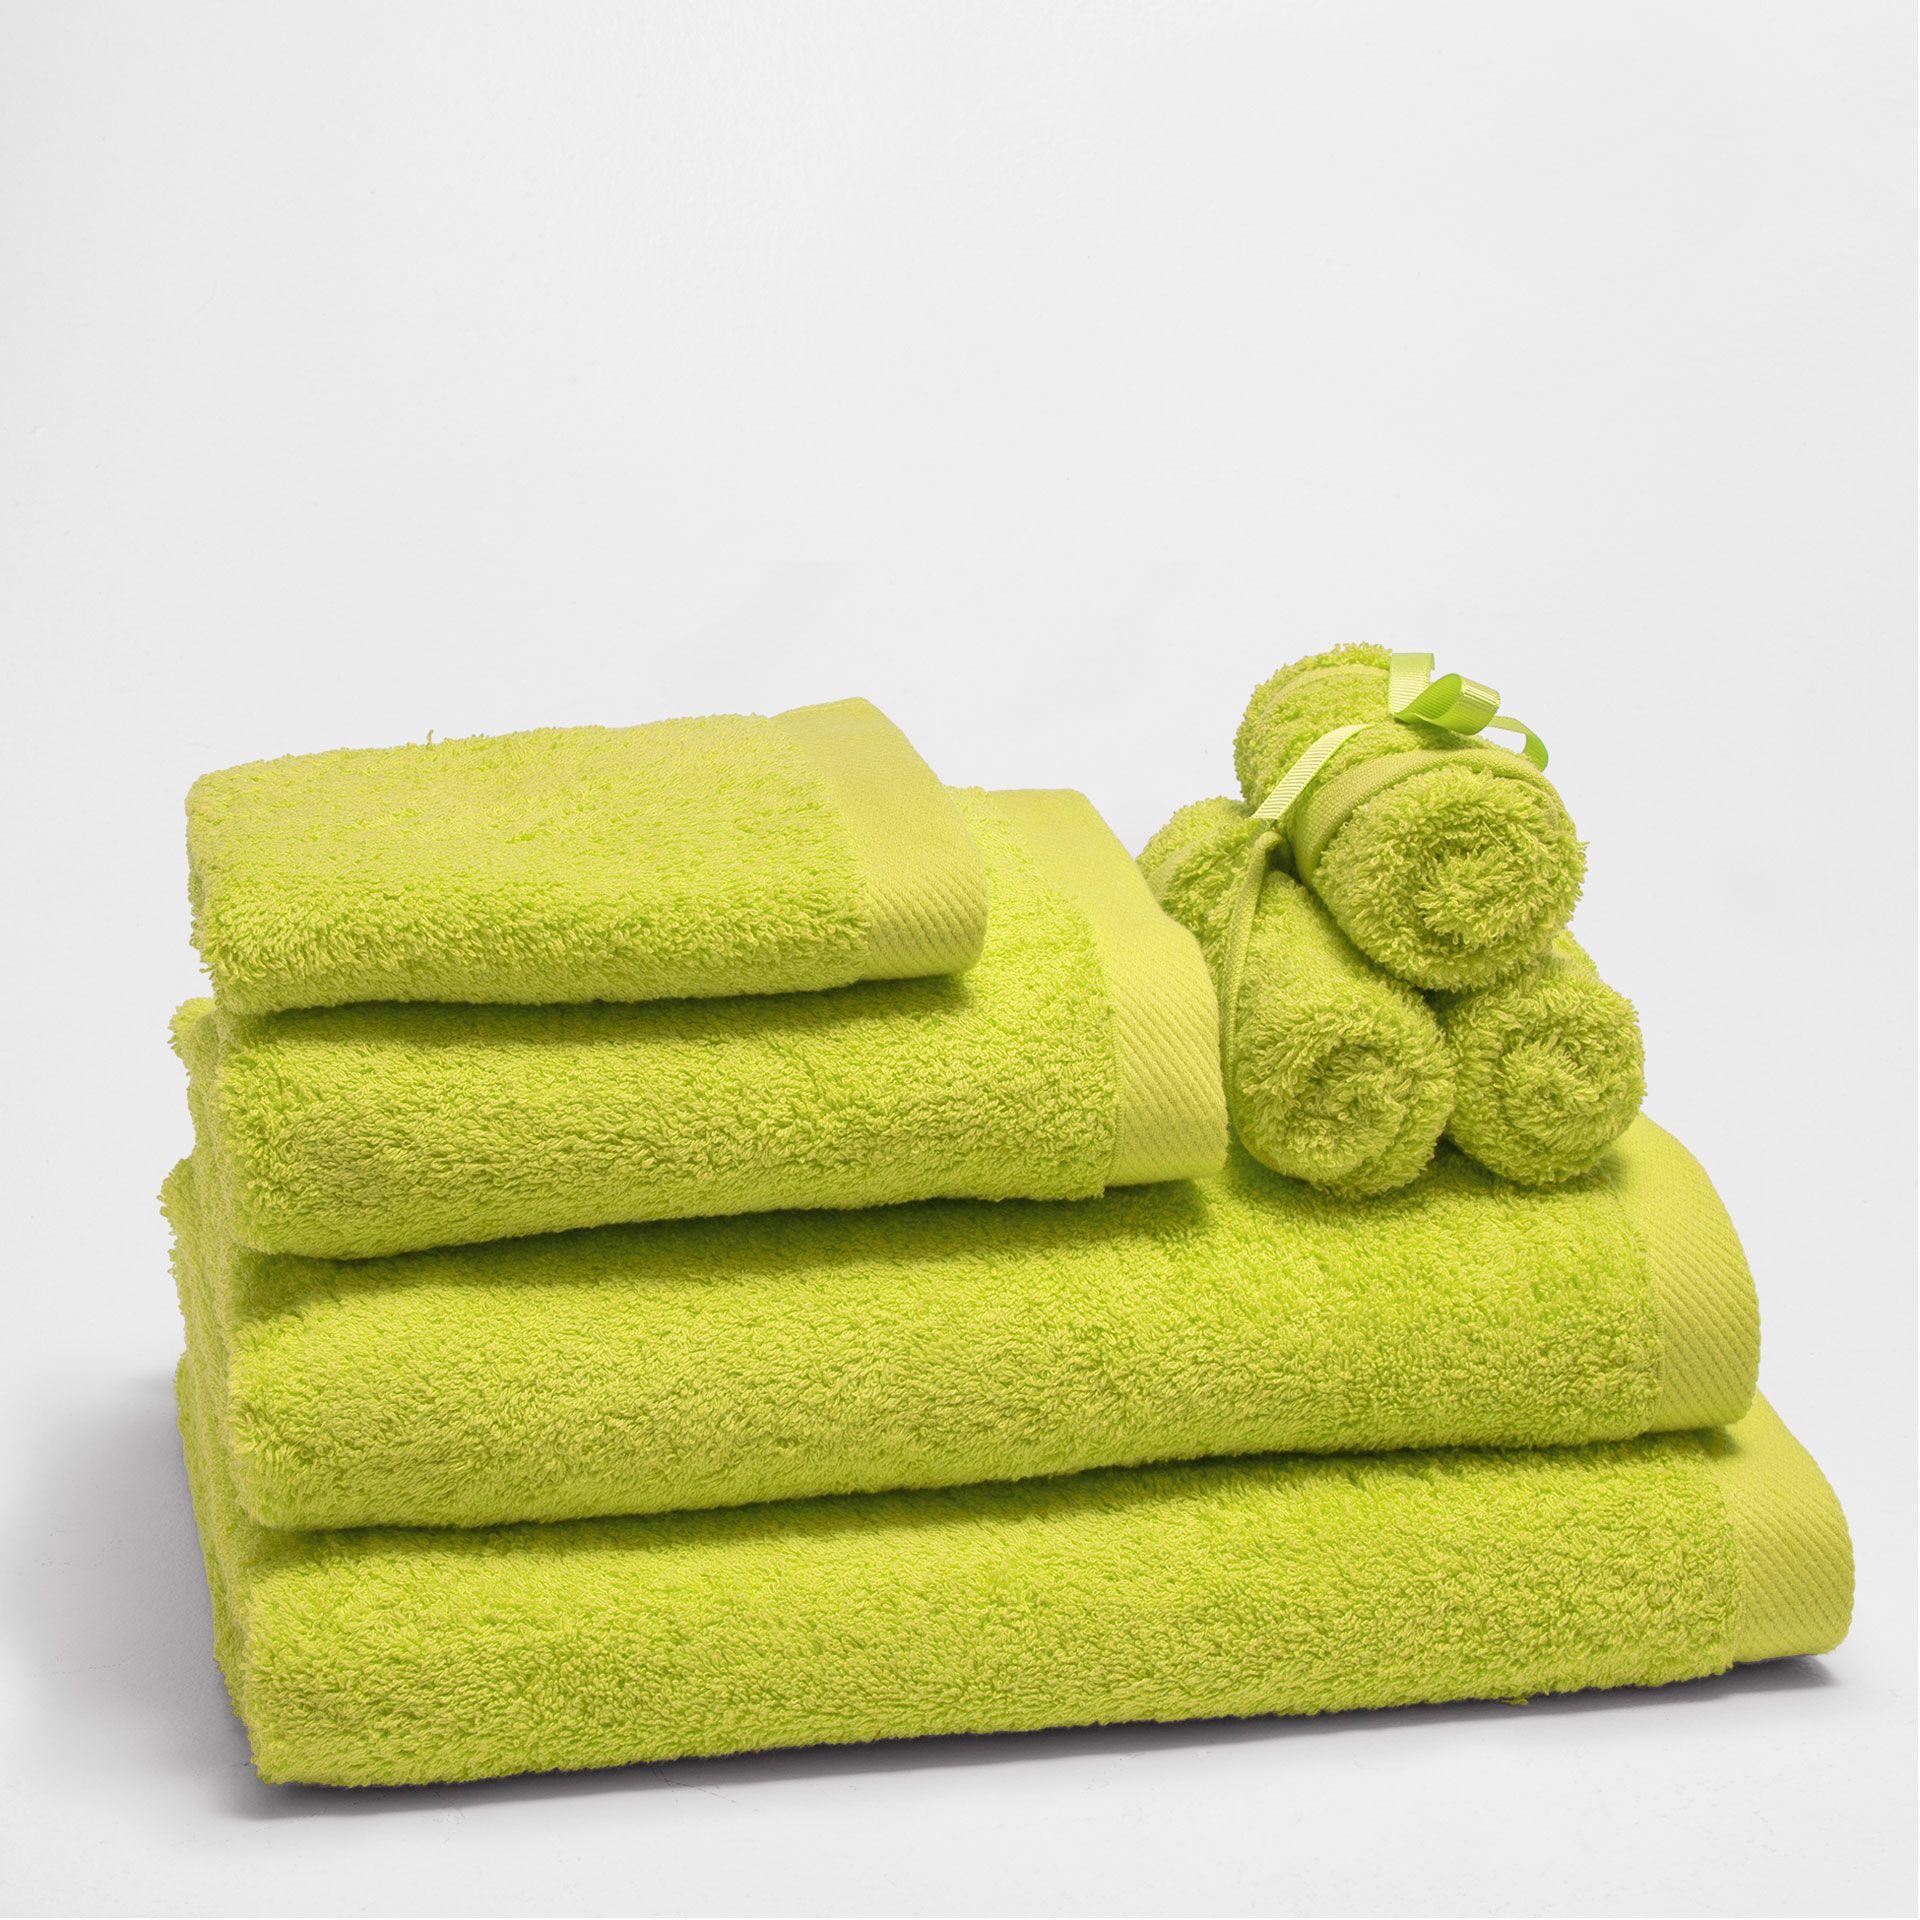 Towel, Zara Home, Bathroom Towels